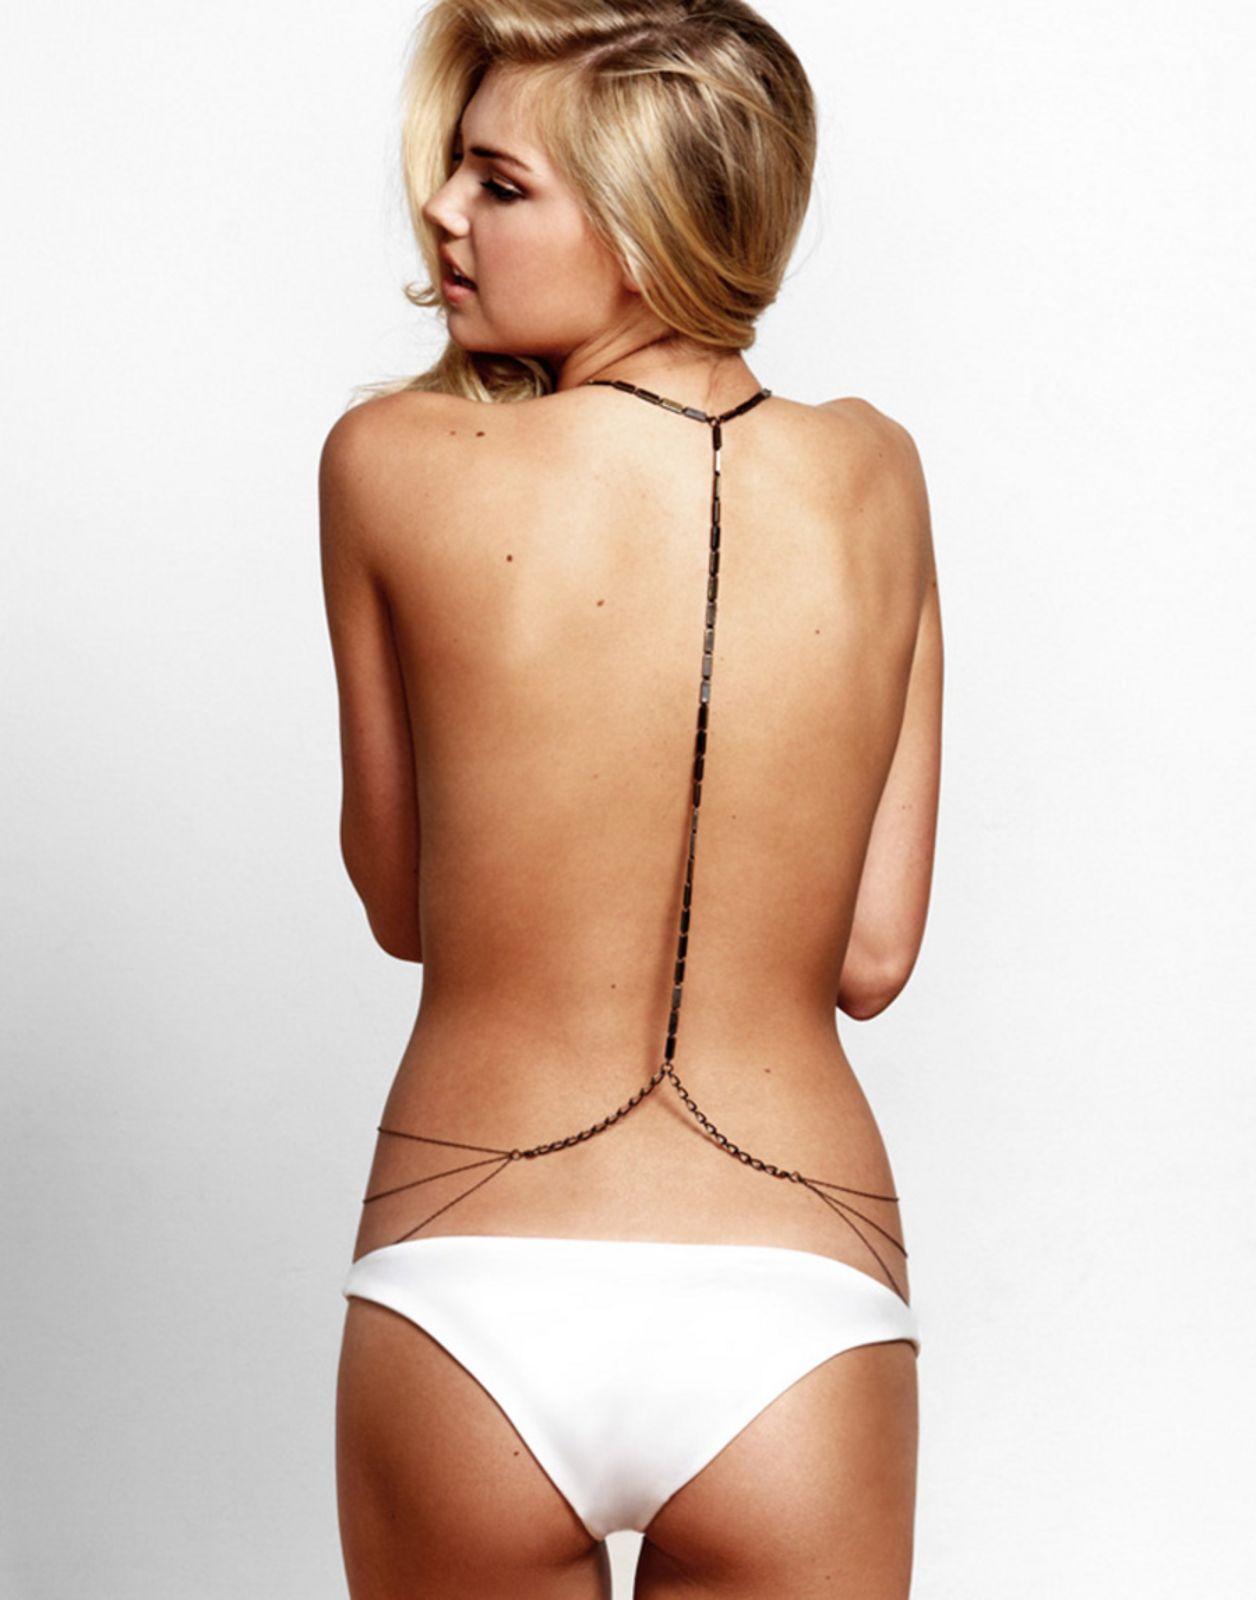 naked (27 photo), Topless Celebrites photo